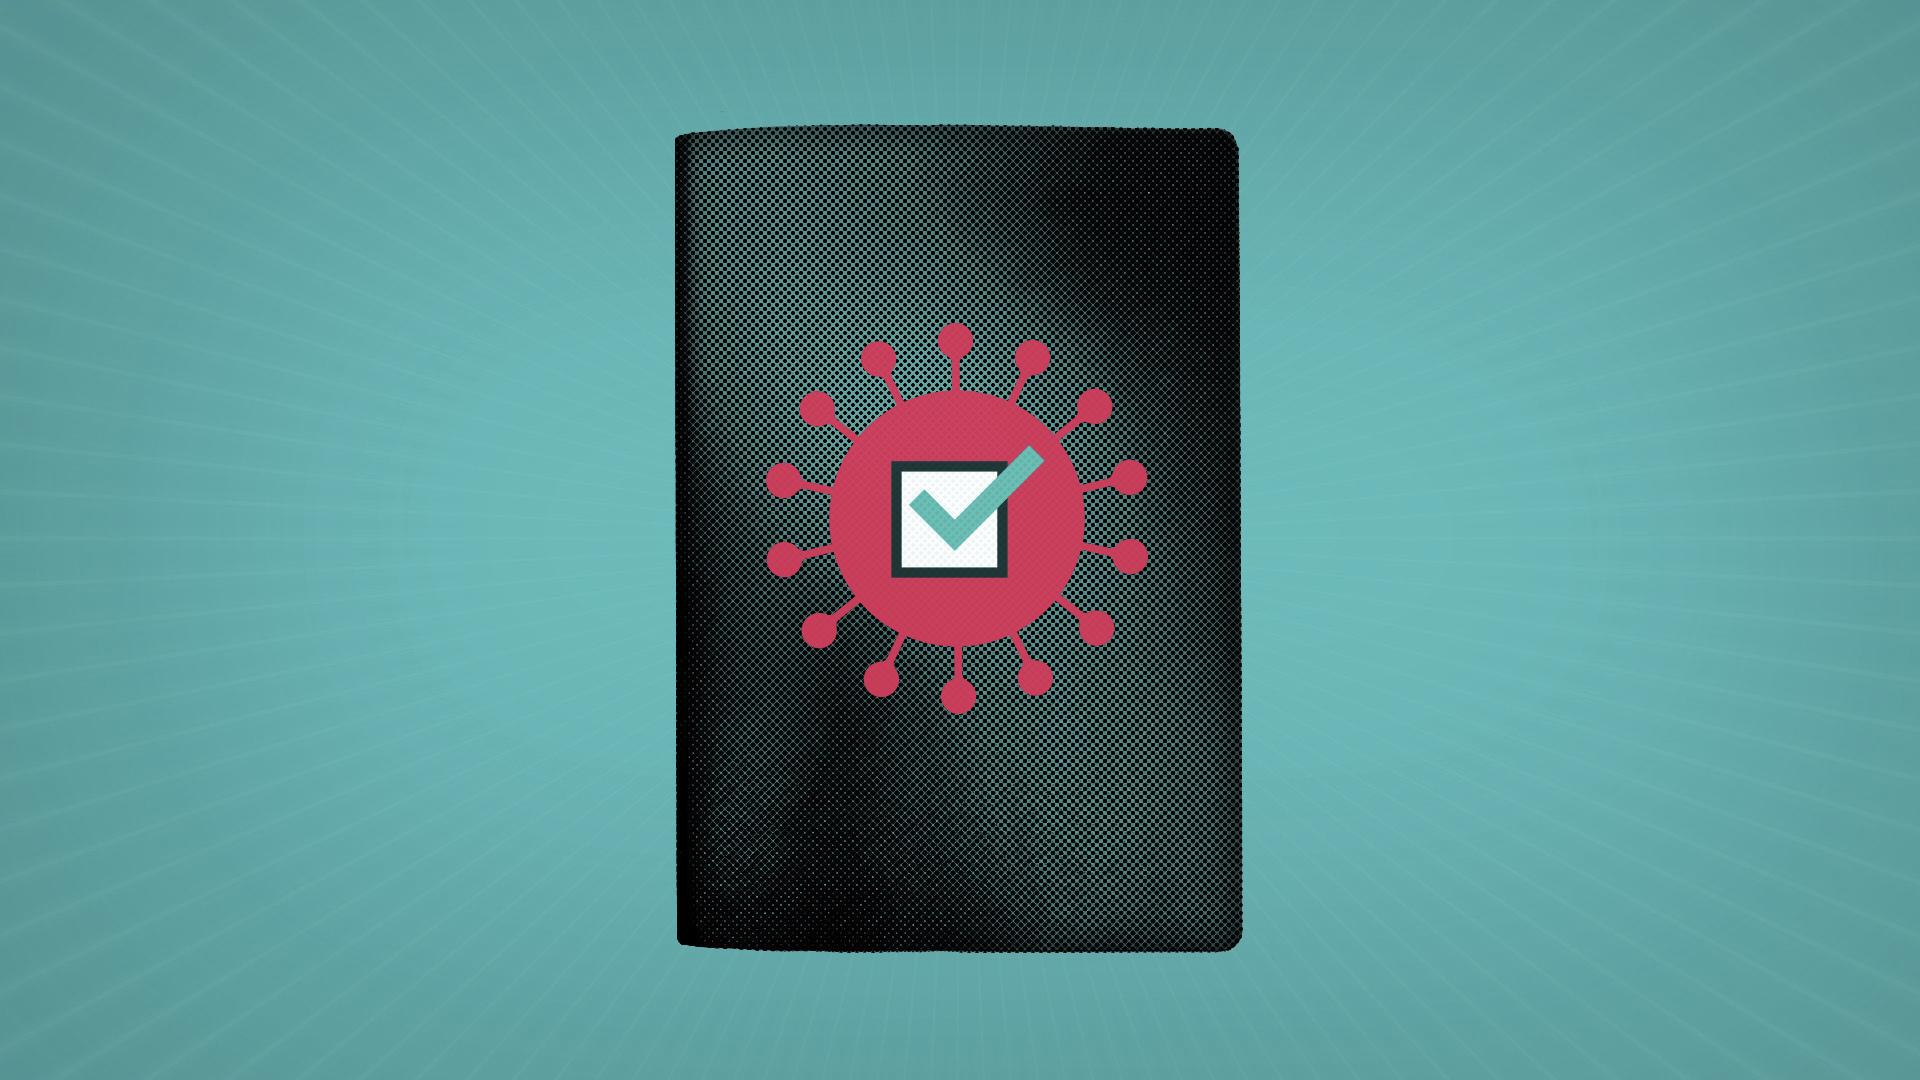 Virus Outbreak-Viral Questions-Vaccine Passports